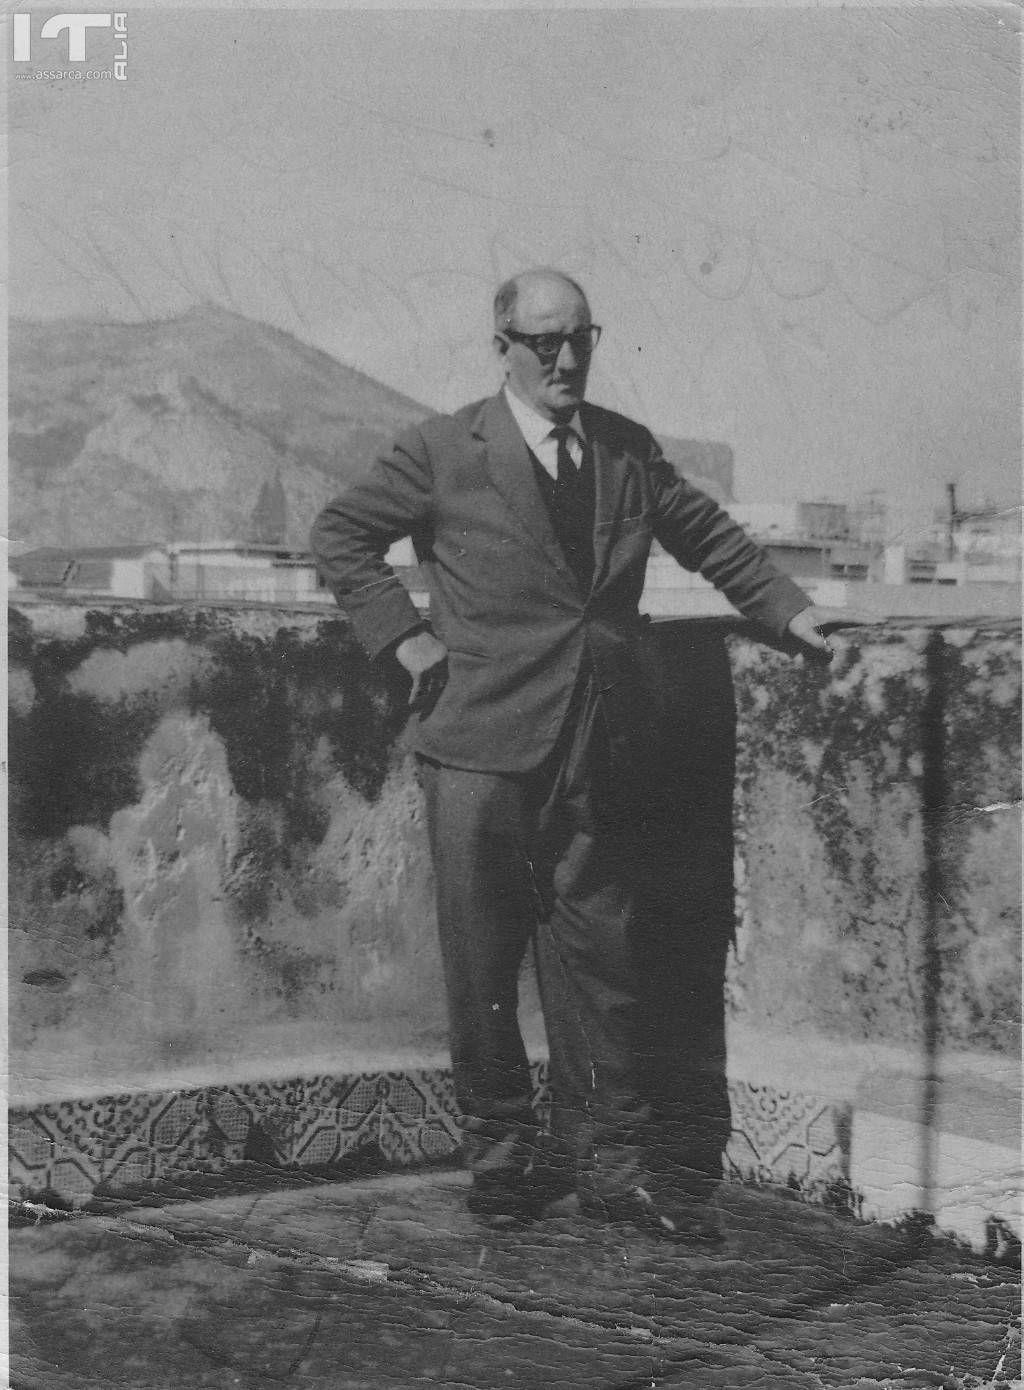 49 - Anni 60 Ciccio Teriaca - Archiphoto Francesco Teriaca